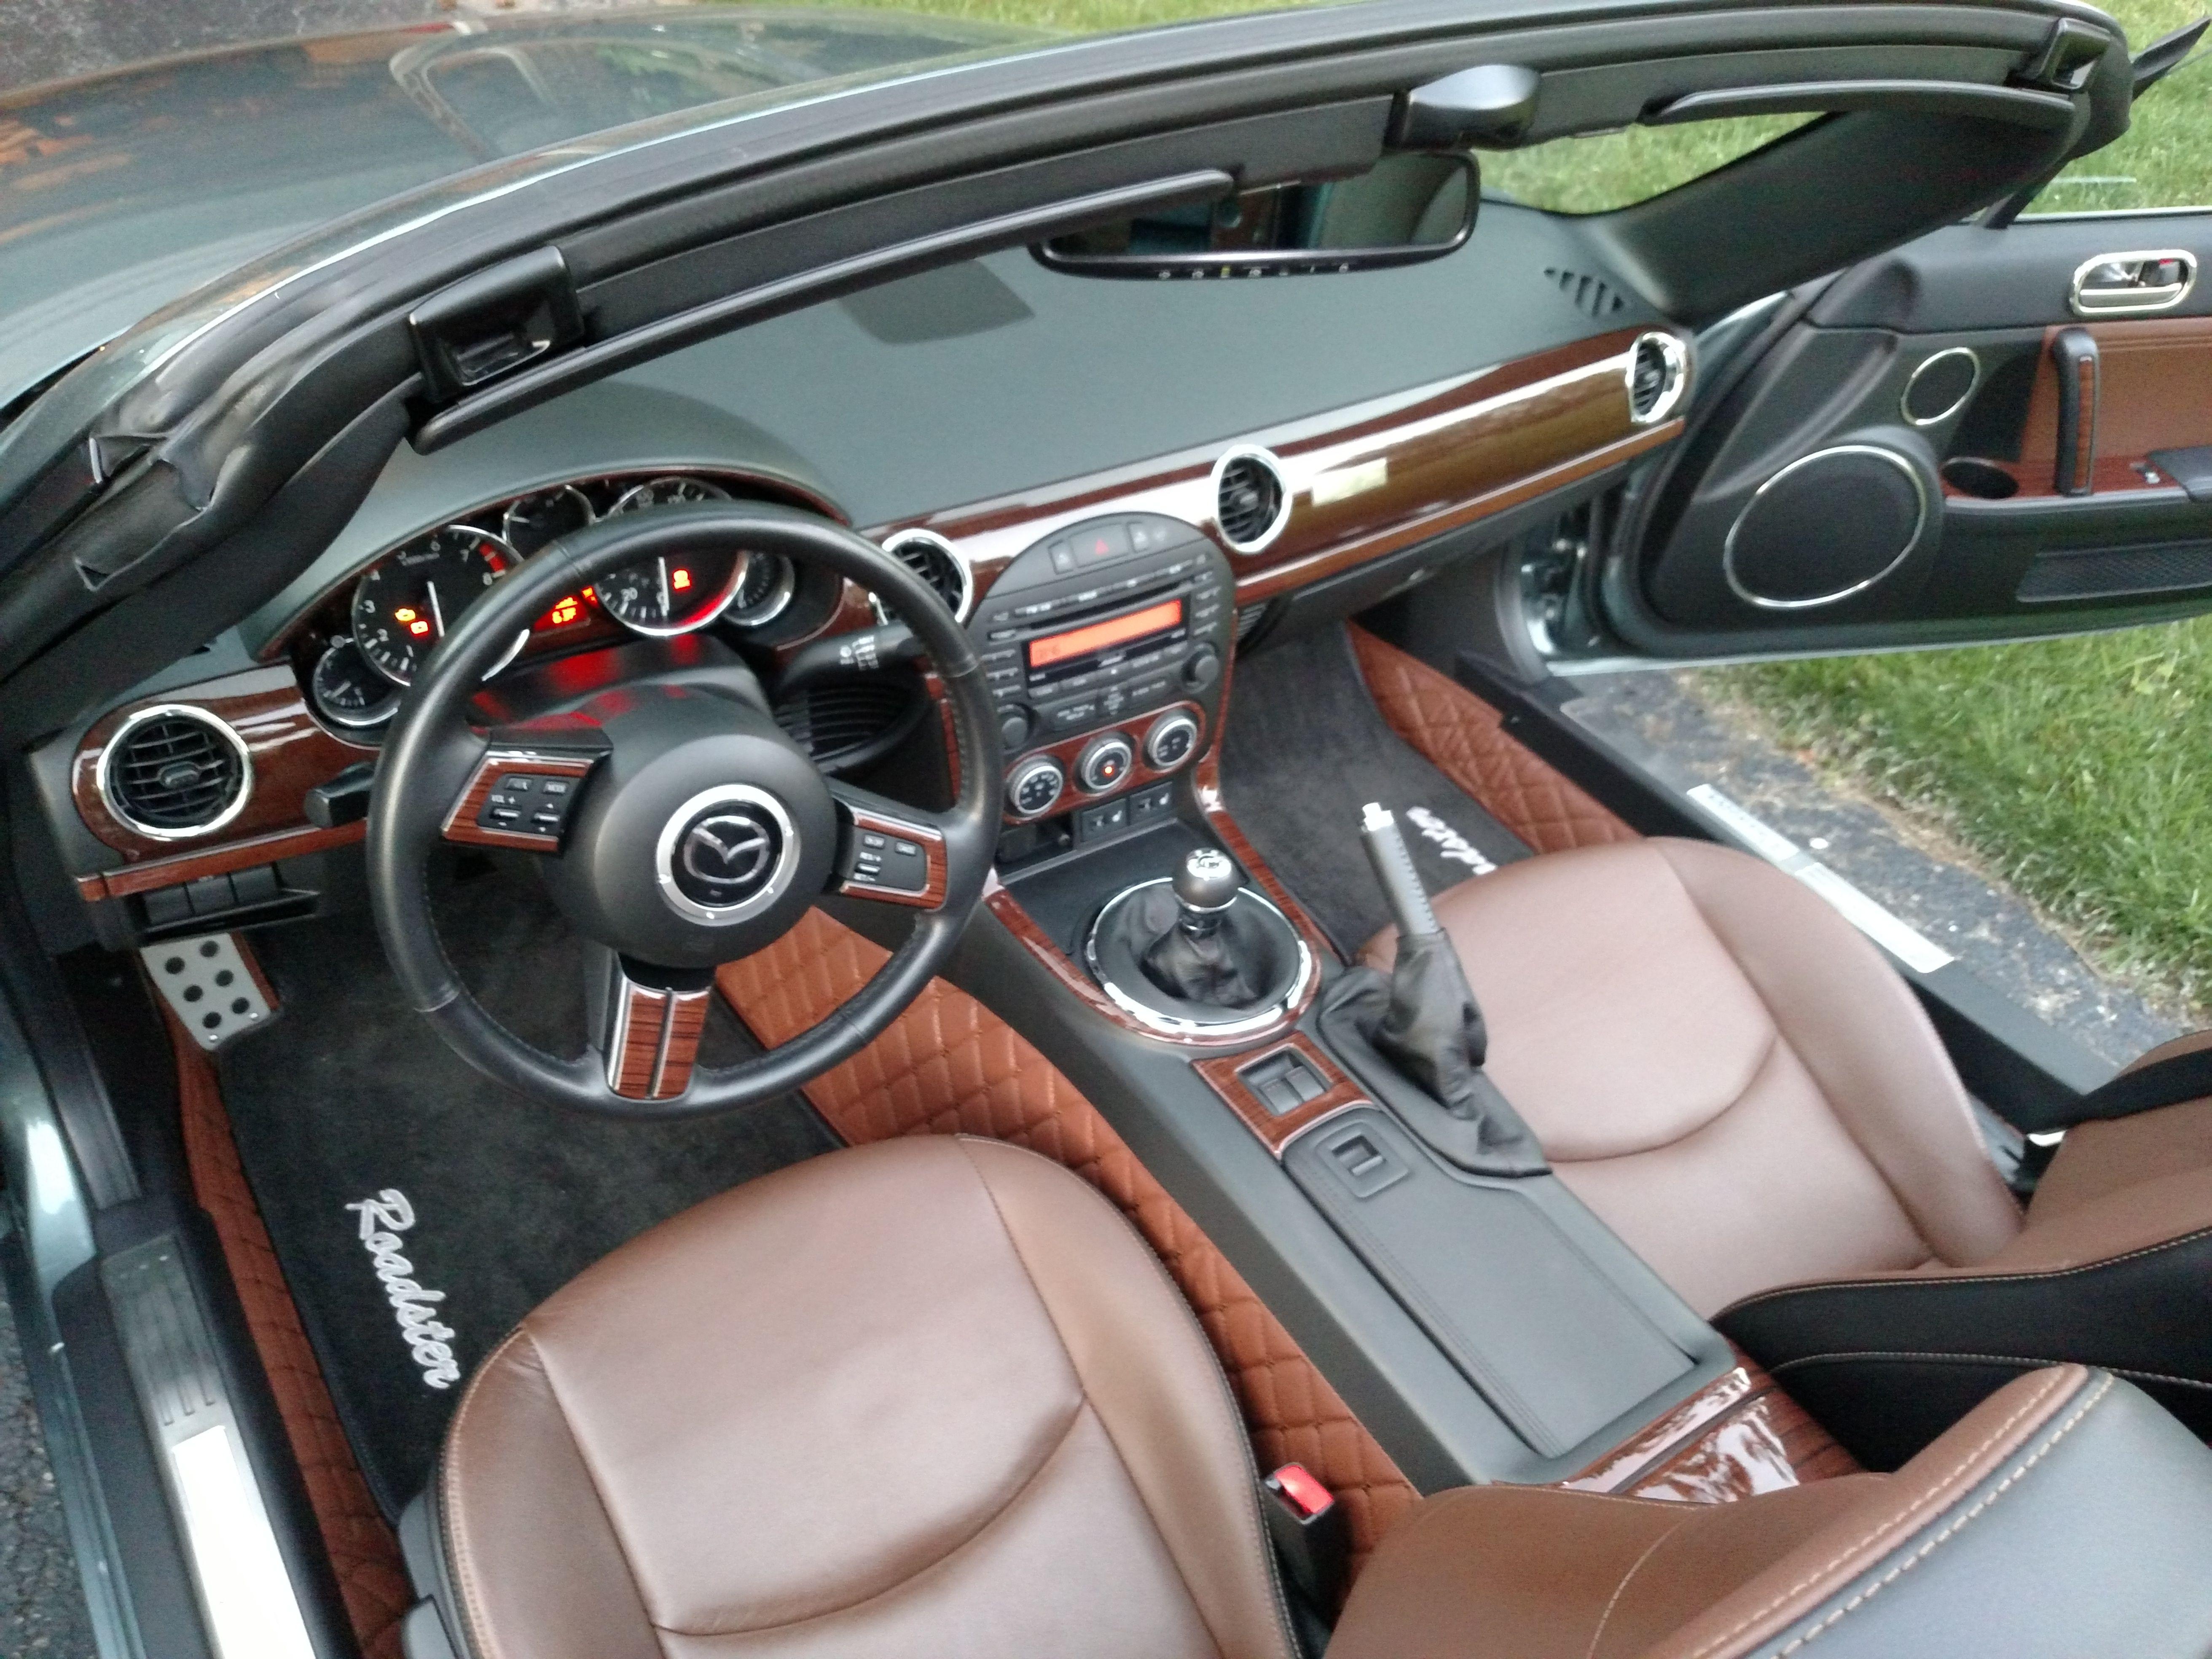 Carbonmiata Quilted Floor Mats For Nc Premade Material Set Of 2 Mazda Miata Mx 5 Topmiata Mazda Miata Miata Mazda